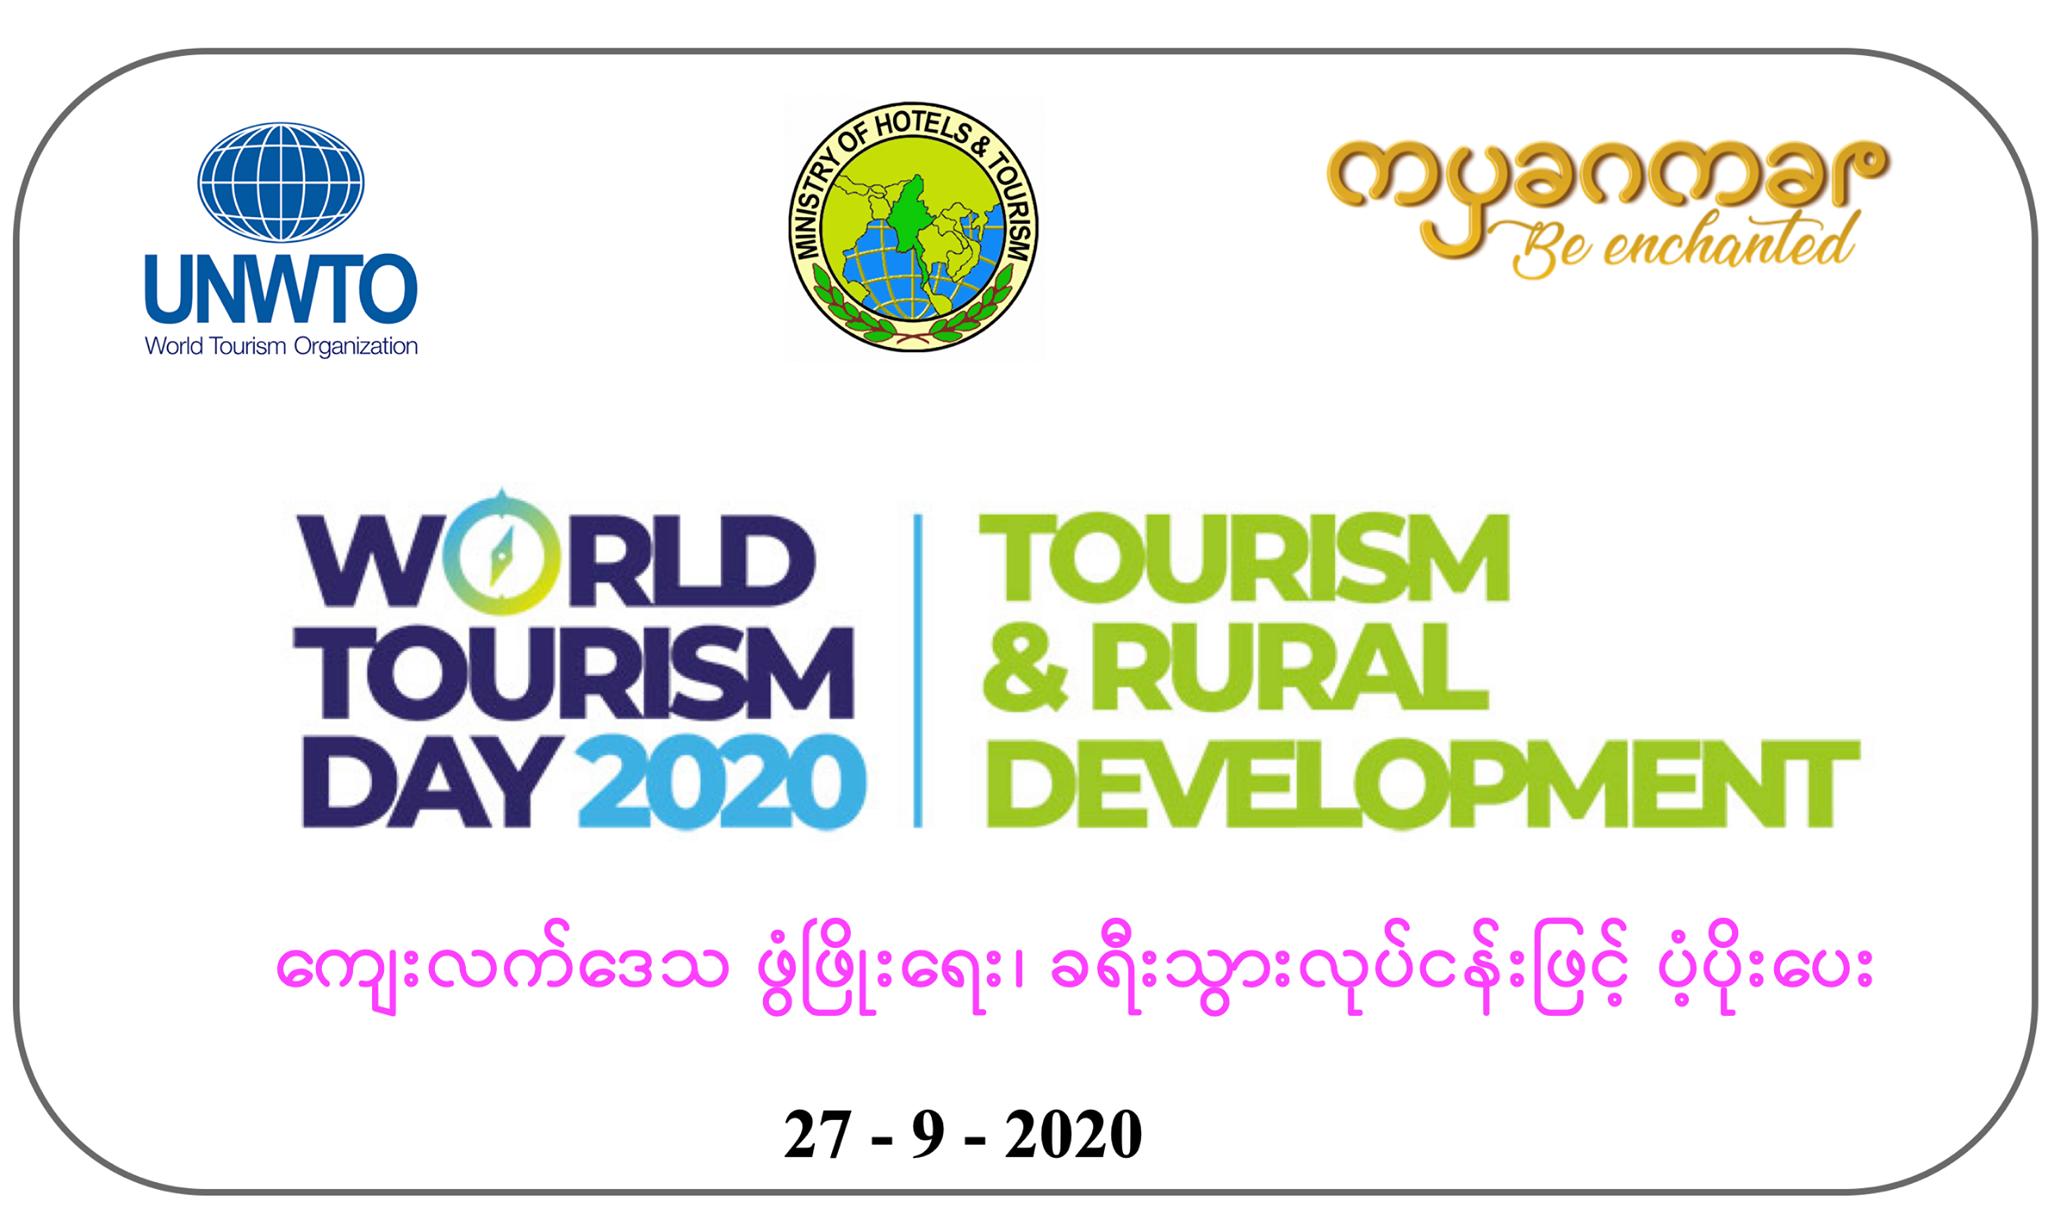 World Tourism Day 2020, Myanmar